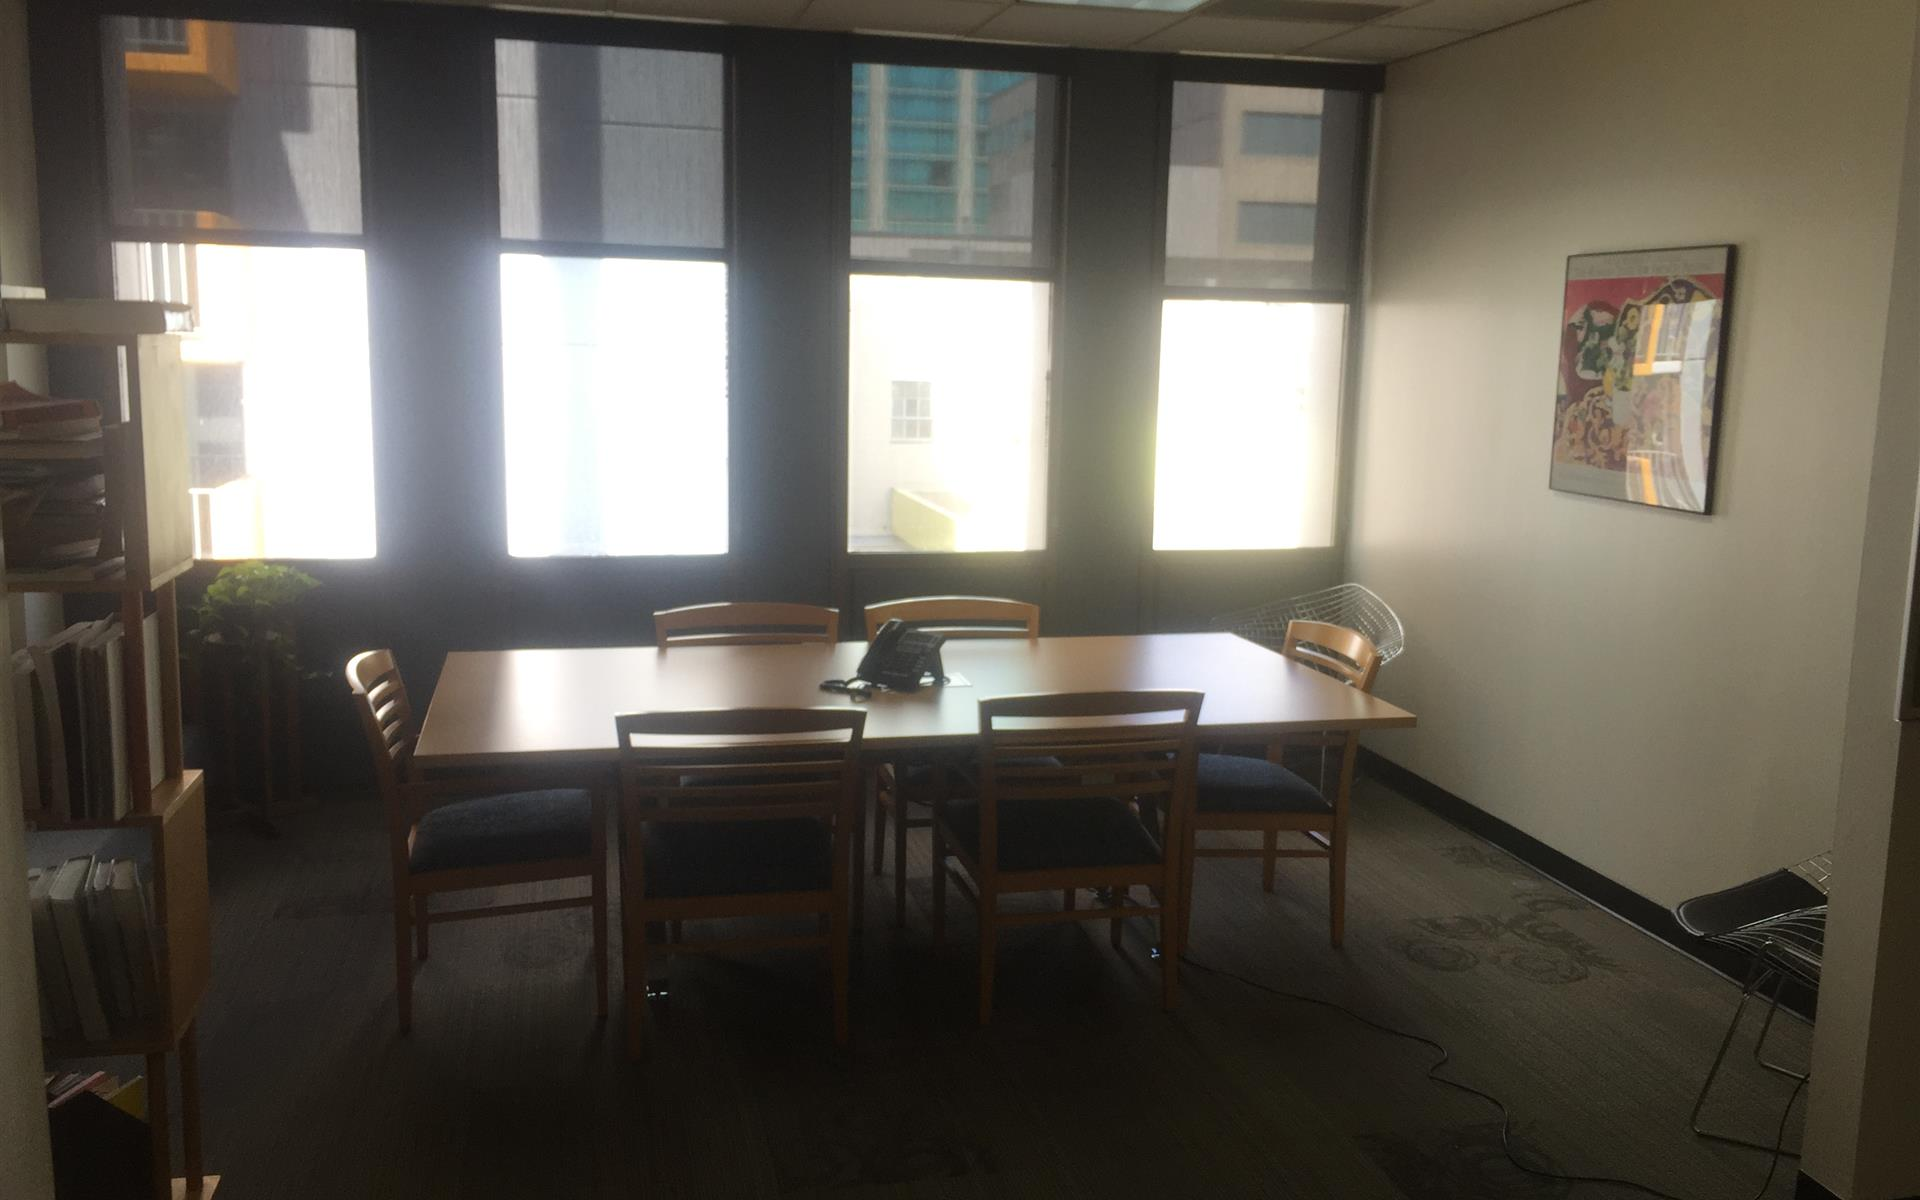 Renaissance Entrepreneurship Center - 3rd Floor Open Area Meeting Room